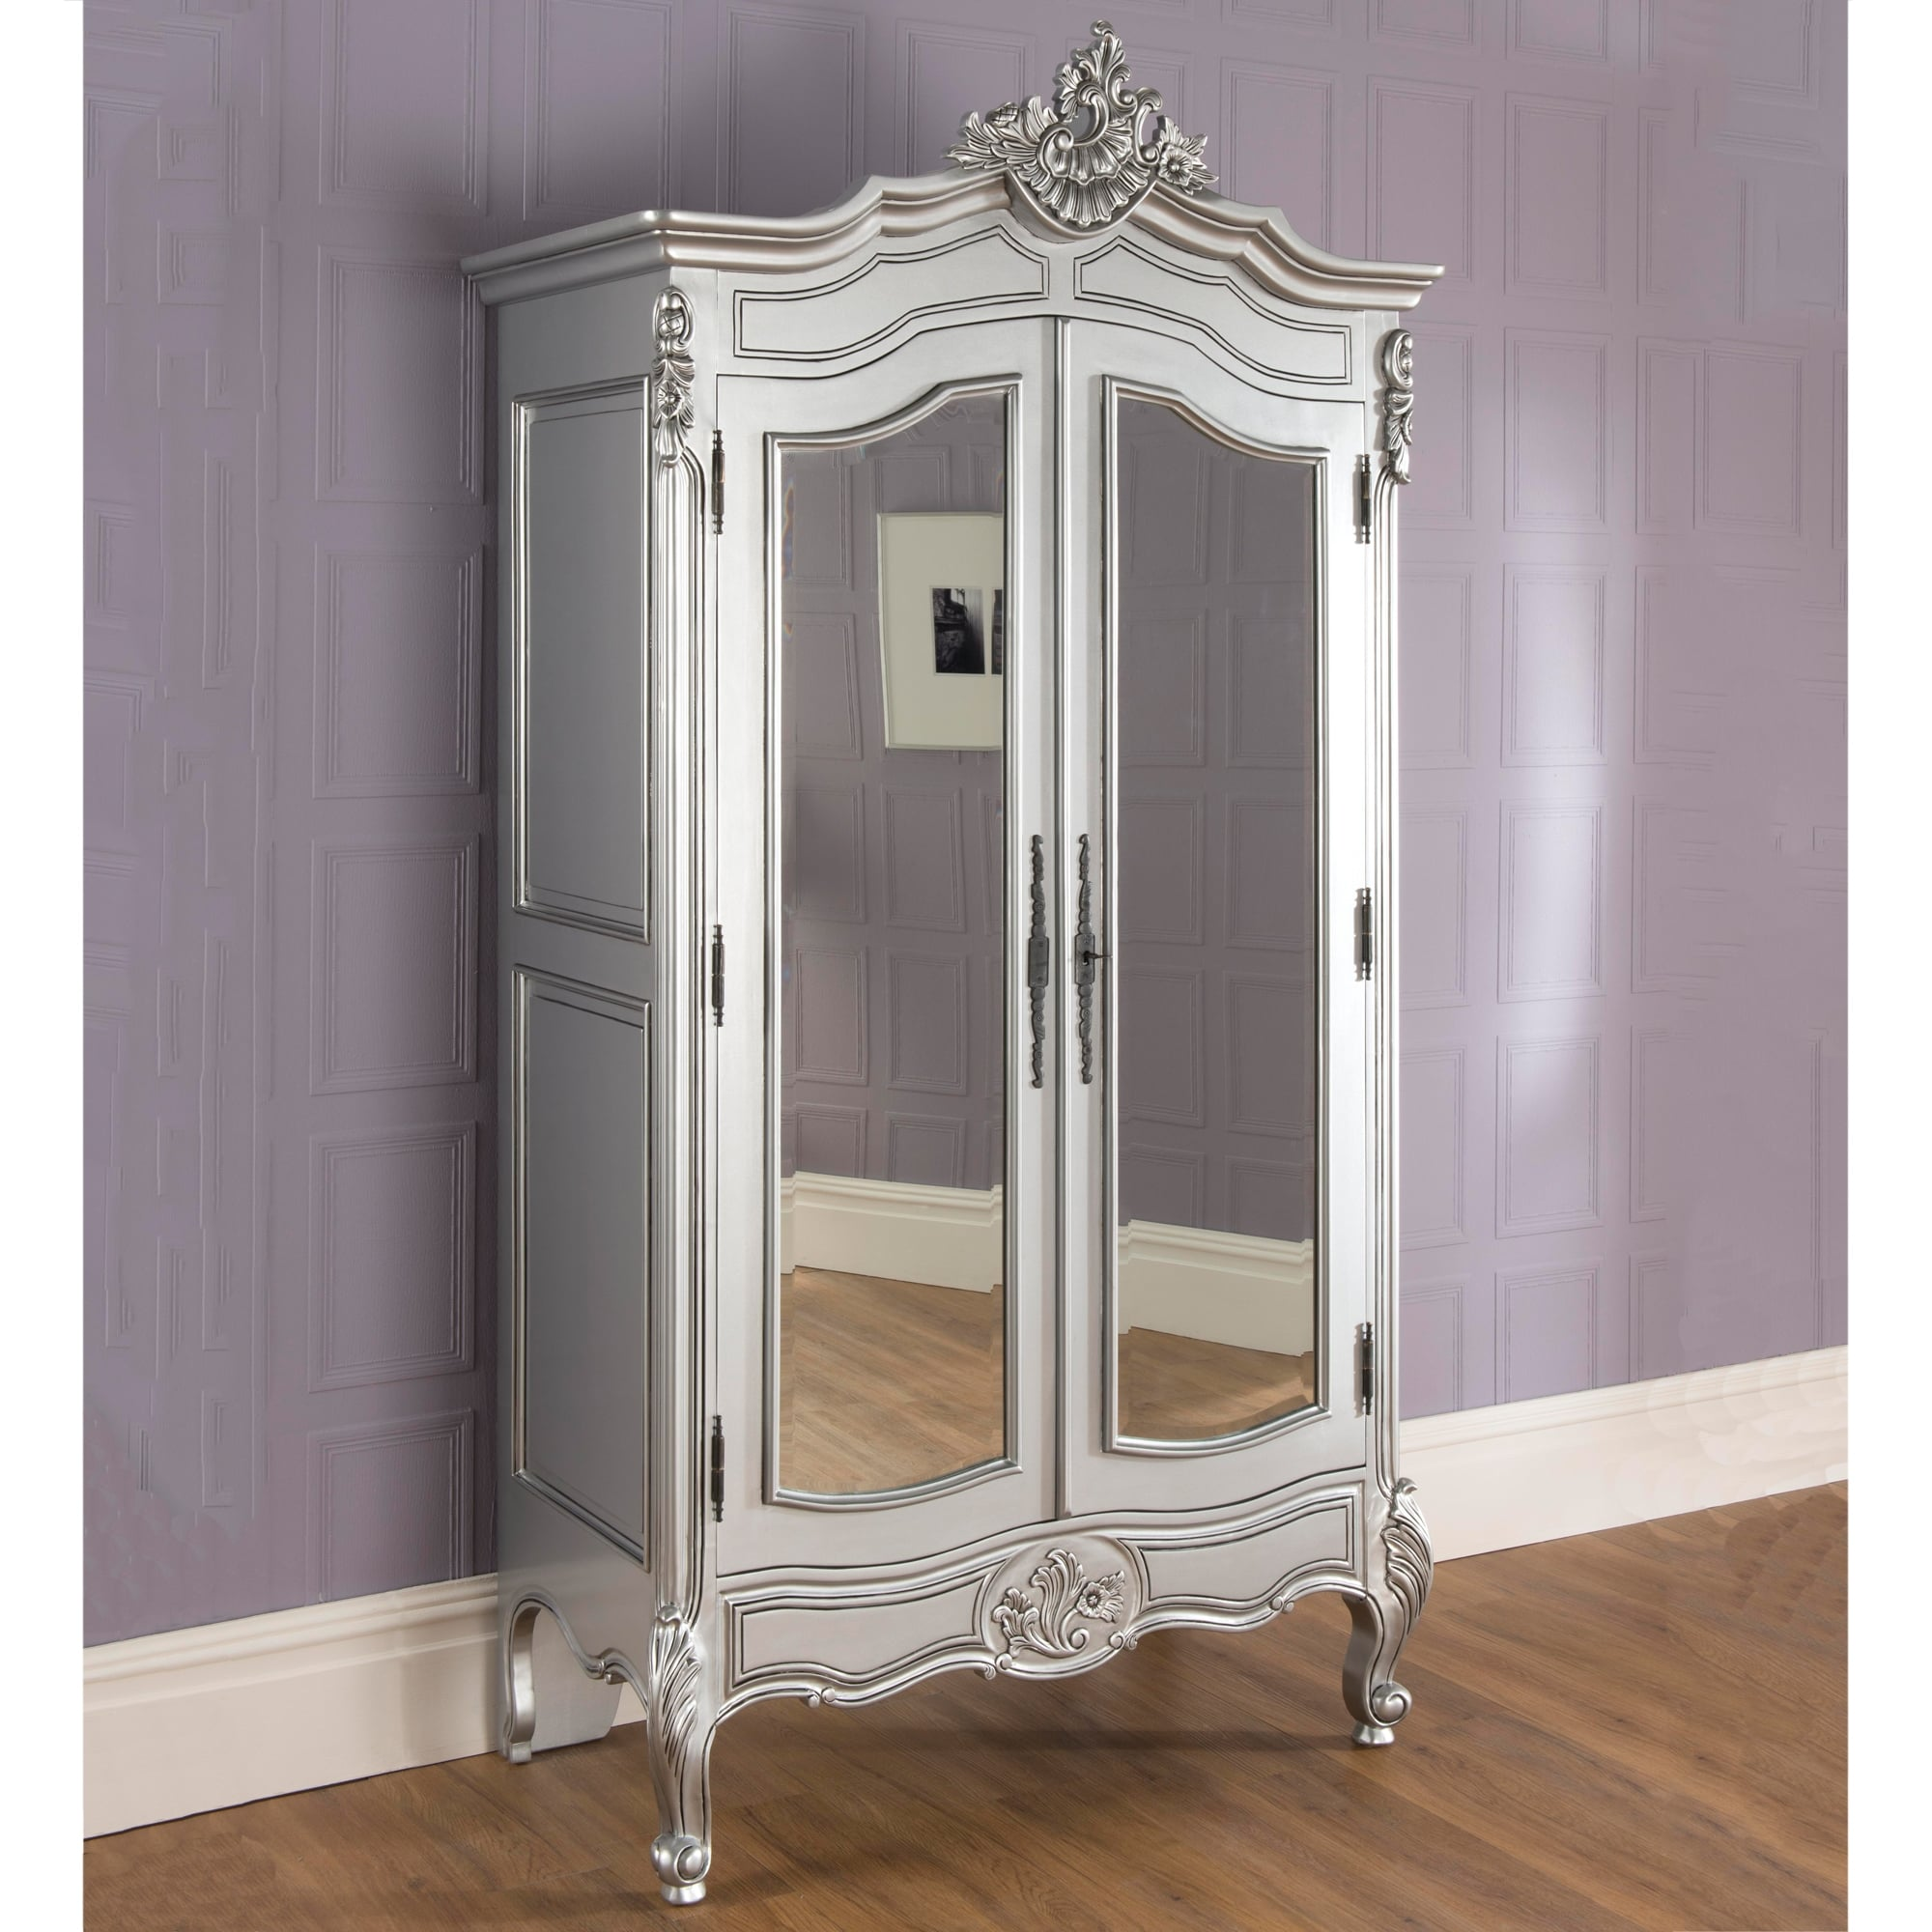 la rochelle antique french wardrobe works exceptional. Black Bedroom Furniture Sets. Home Design Ideas